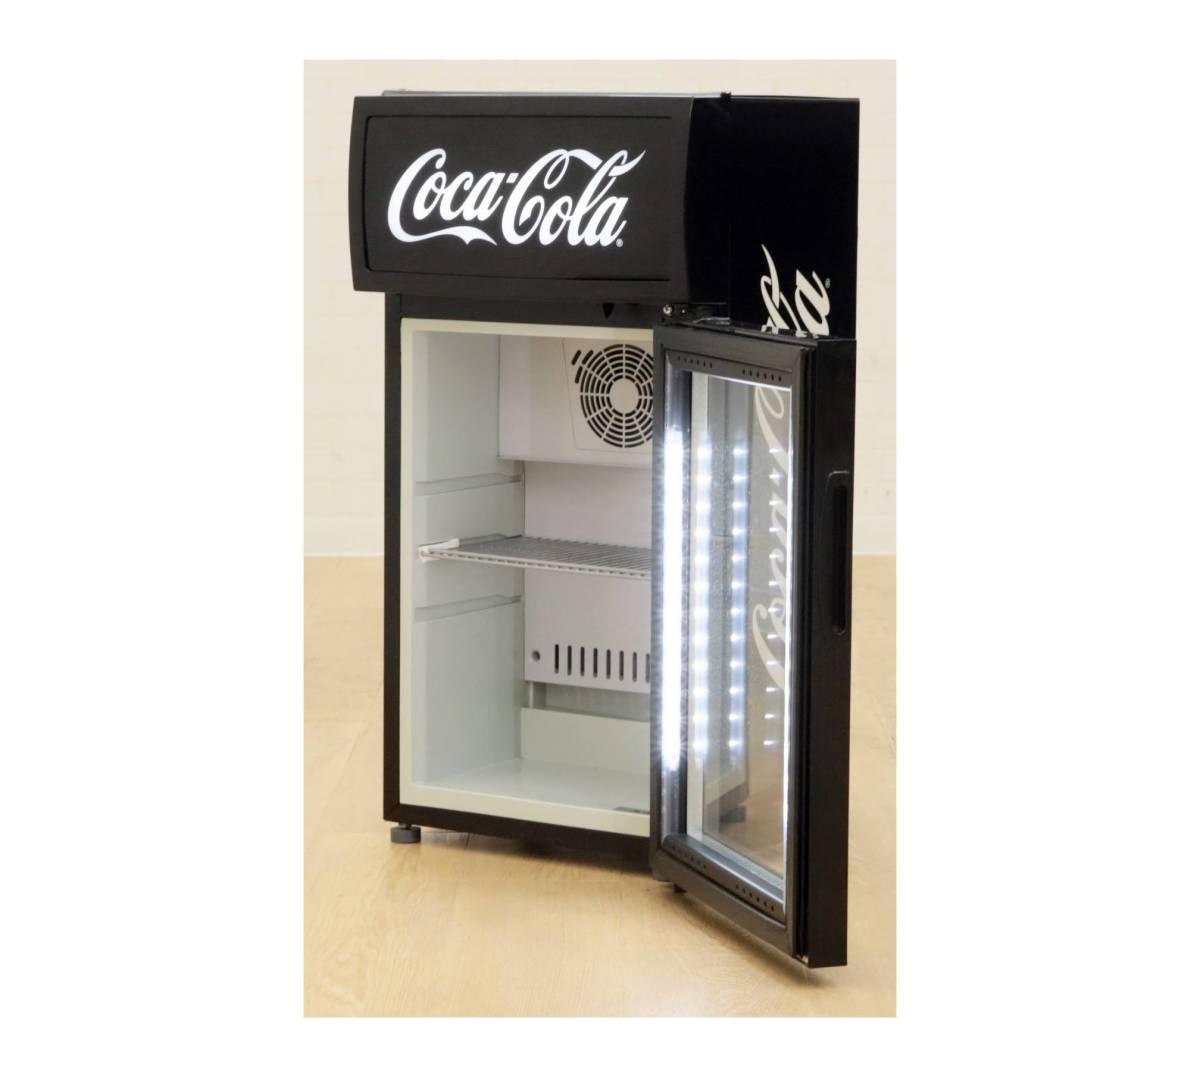 D Q051814 美品 Haier ハイアール Haier ハイアール 冷蔵ショーケース JR-CC25B 内容積25L _画像3